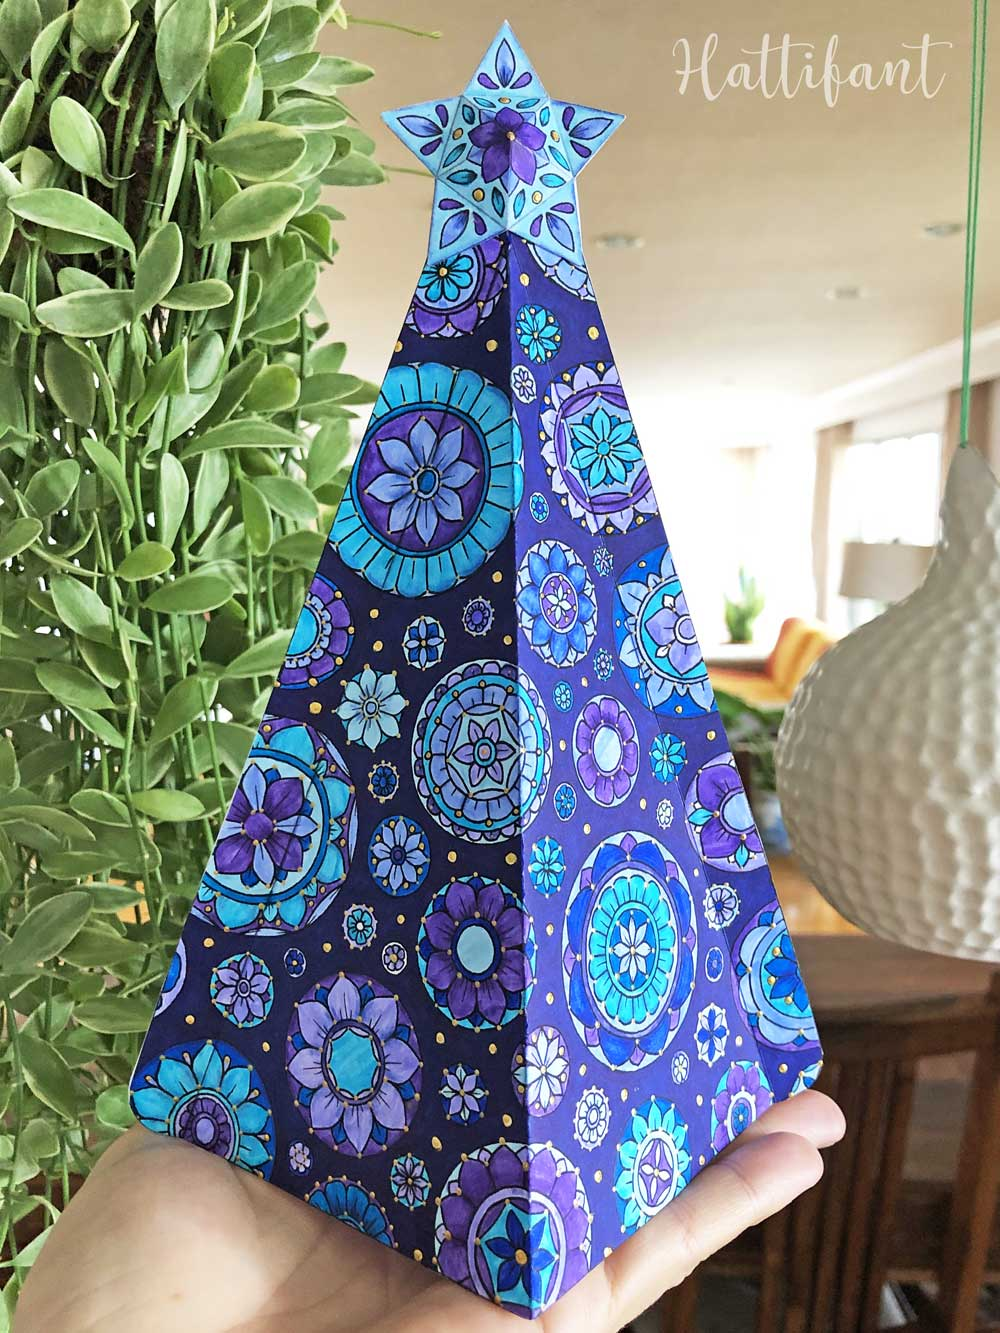 Hattifant 18d mandala christmas tree to color big tree   Hattifant